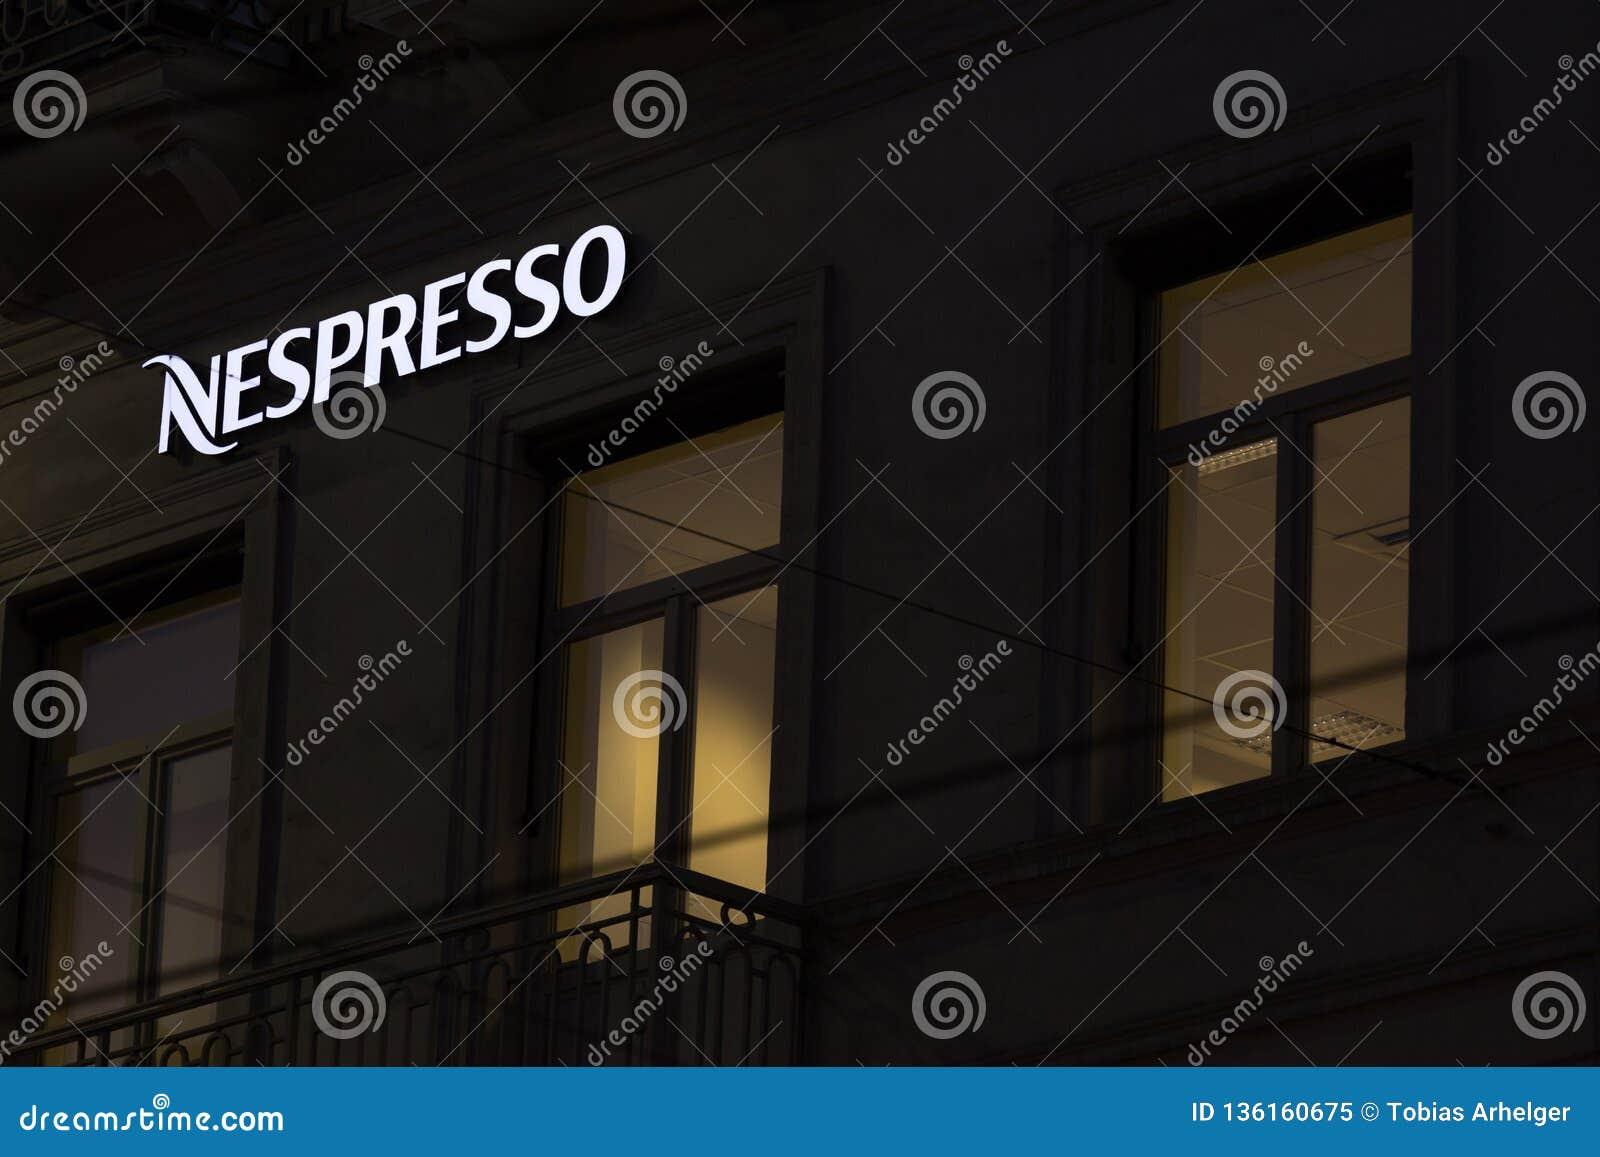 Brussel, Brussel/België - 13 12 18: nespressoteken in Brussel België in de avond